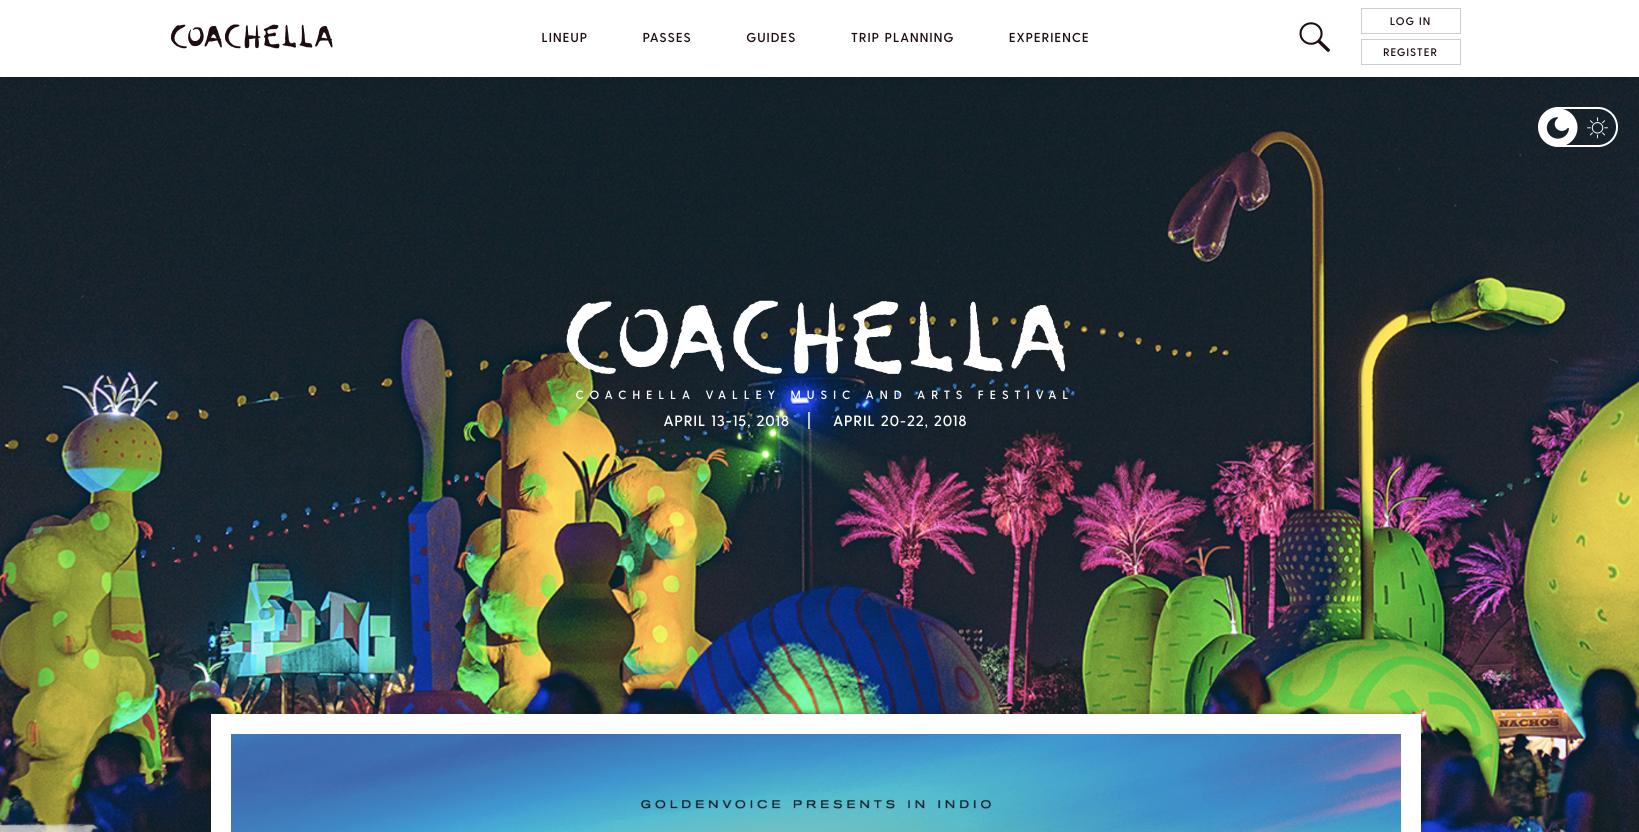 Coachella Homepage Herocomponent Colorful Branding Marketing Coachella Poster Branding